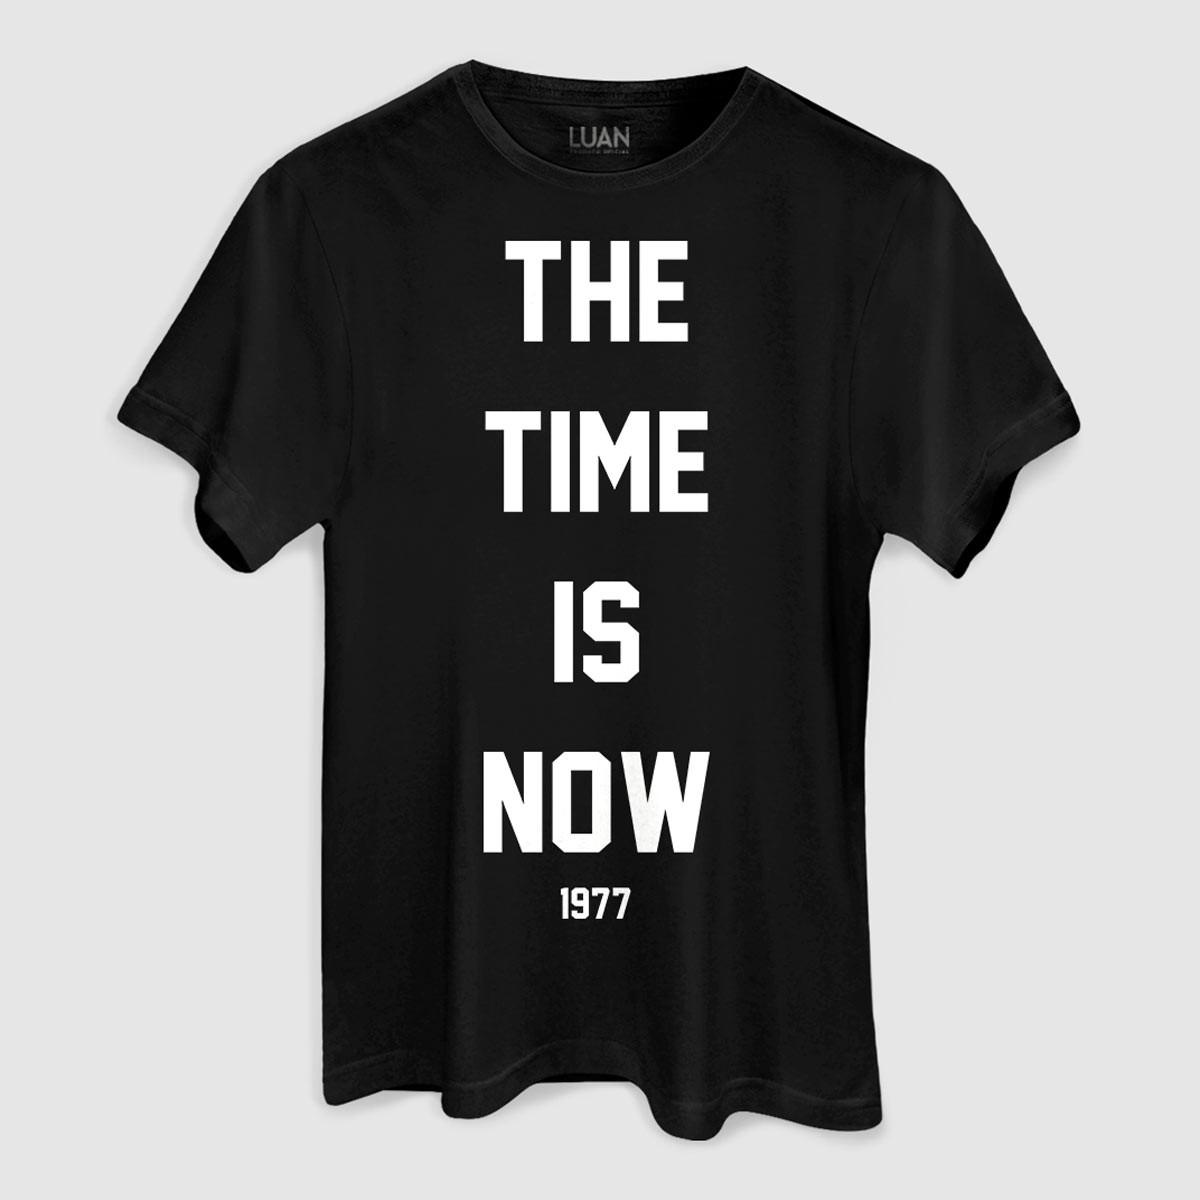 Camiseta Masculina Luan Santana The Time Is Now